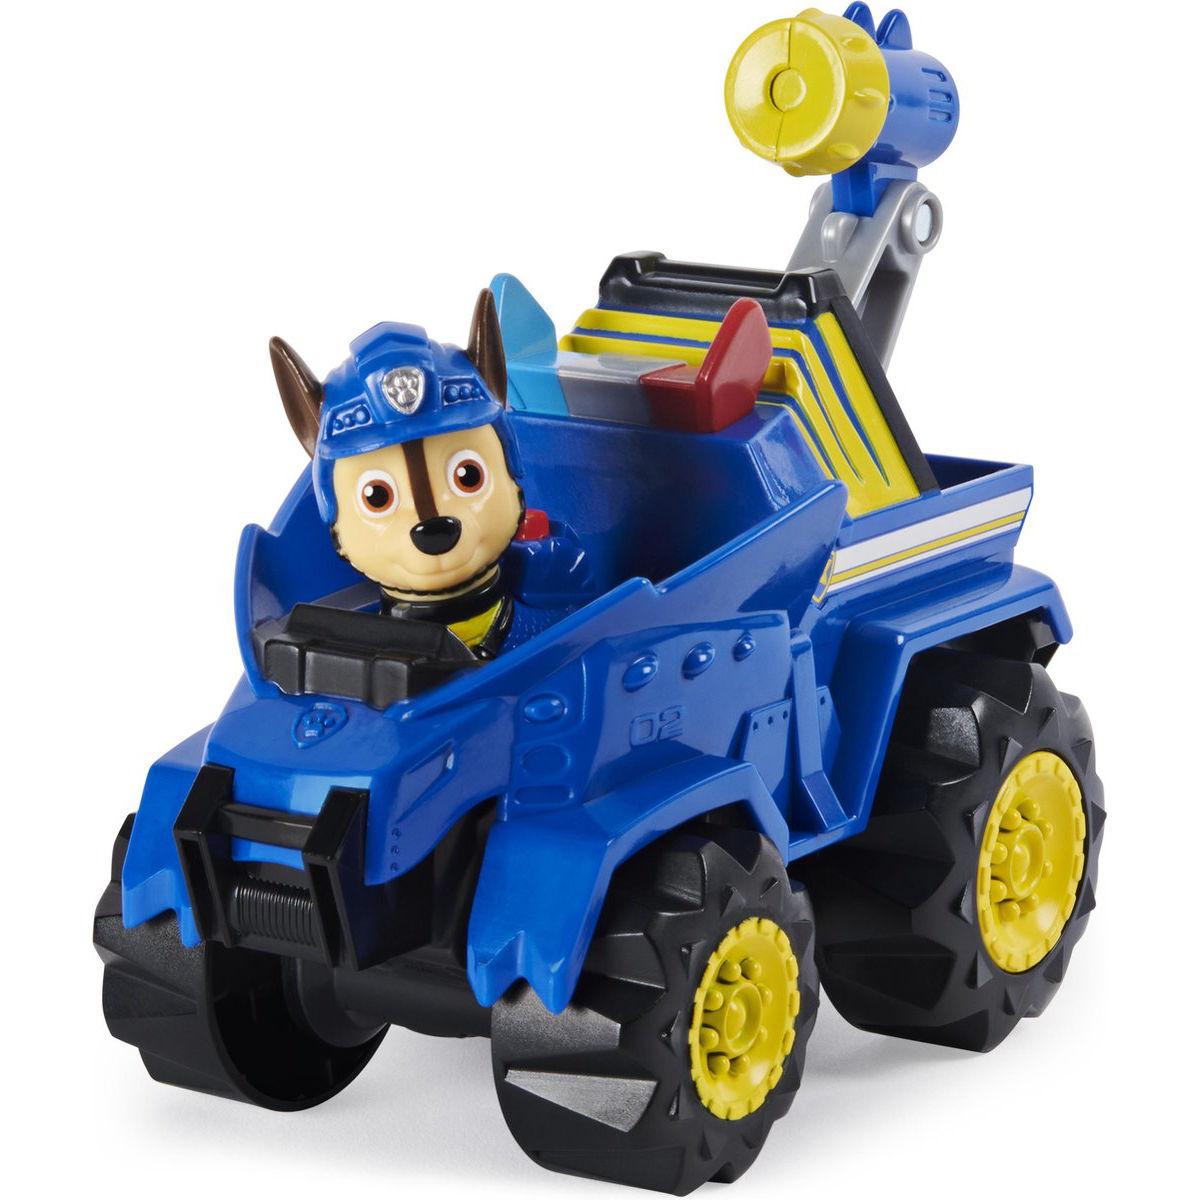 Tlapková patrola Chase dino tématická vozidla